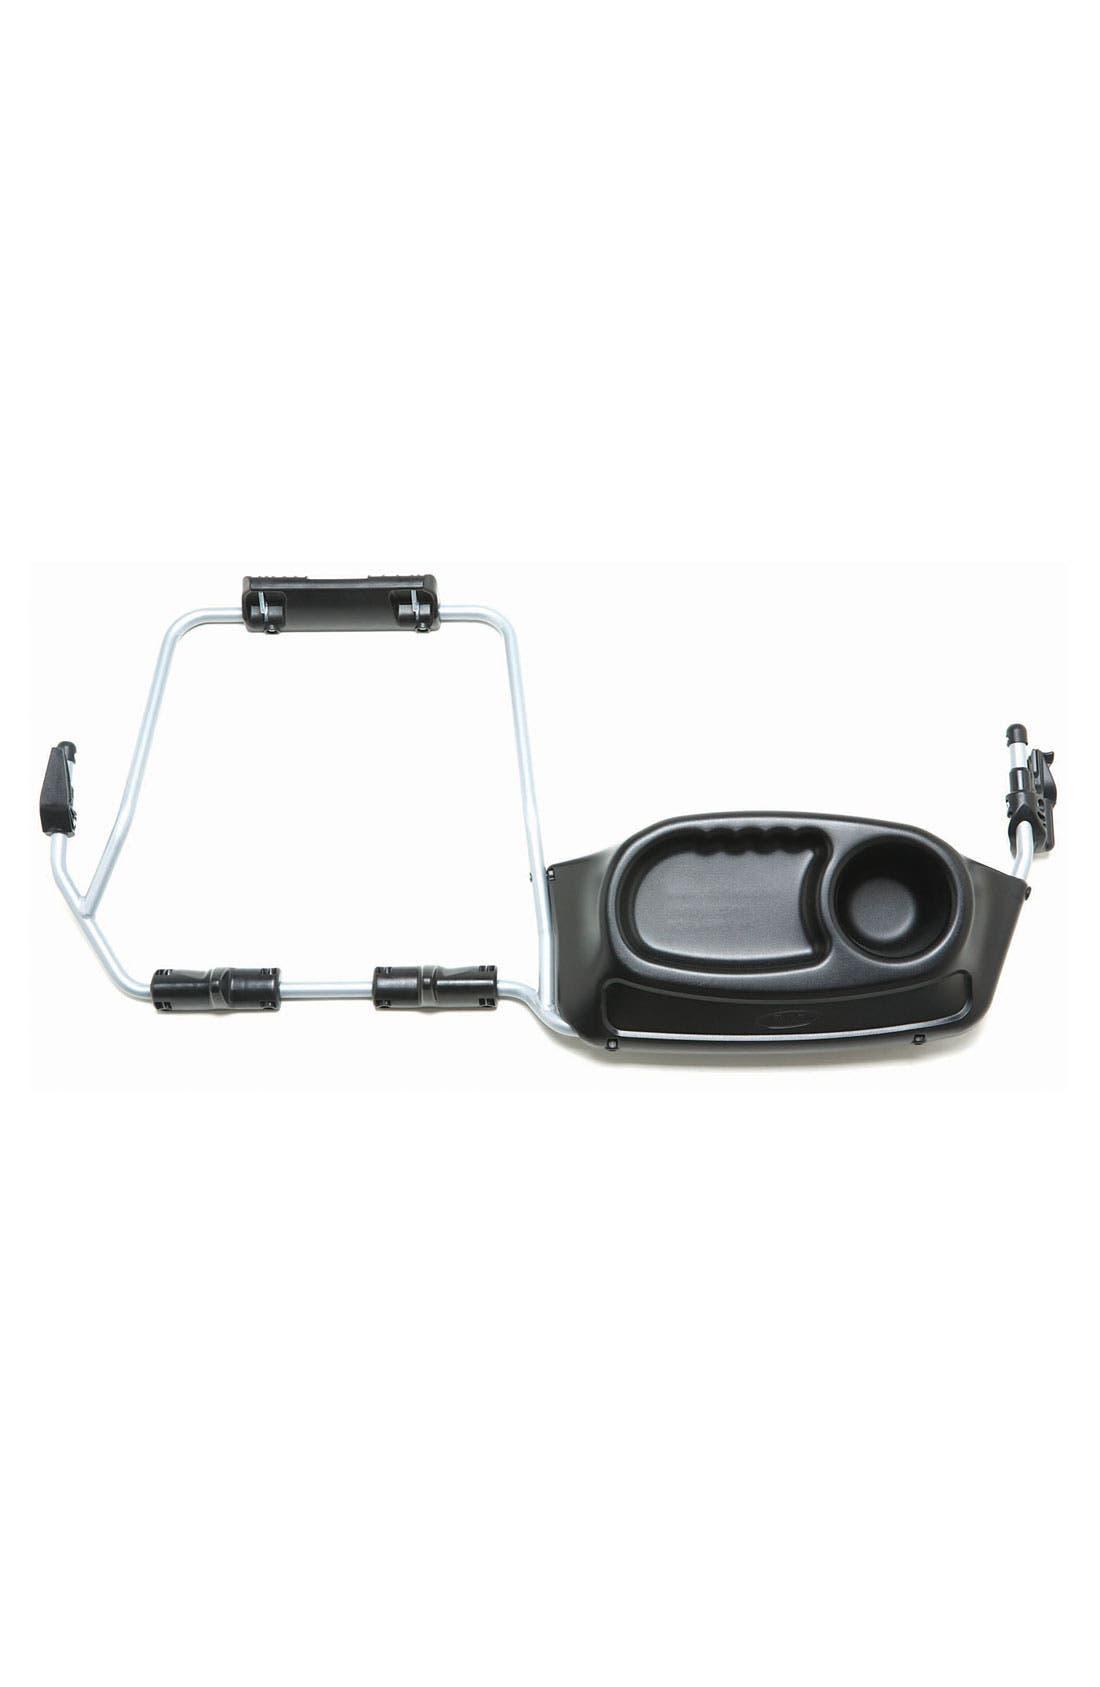 Main Image - BOB Duallie Stroller to Graco Car Seat Adaptor